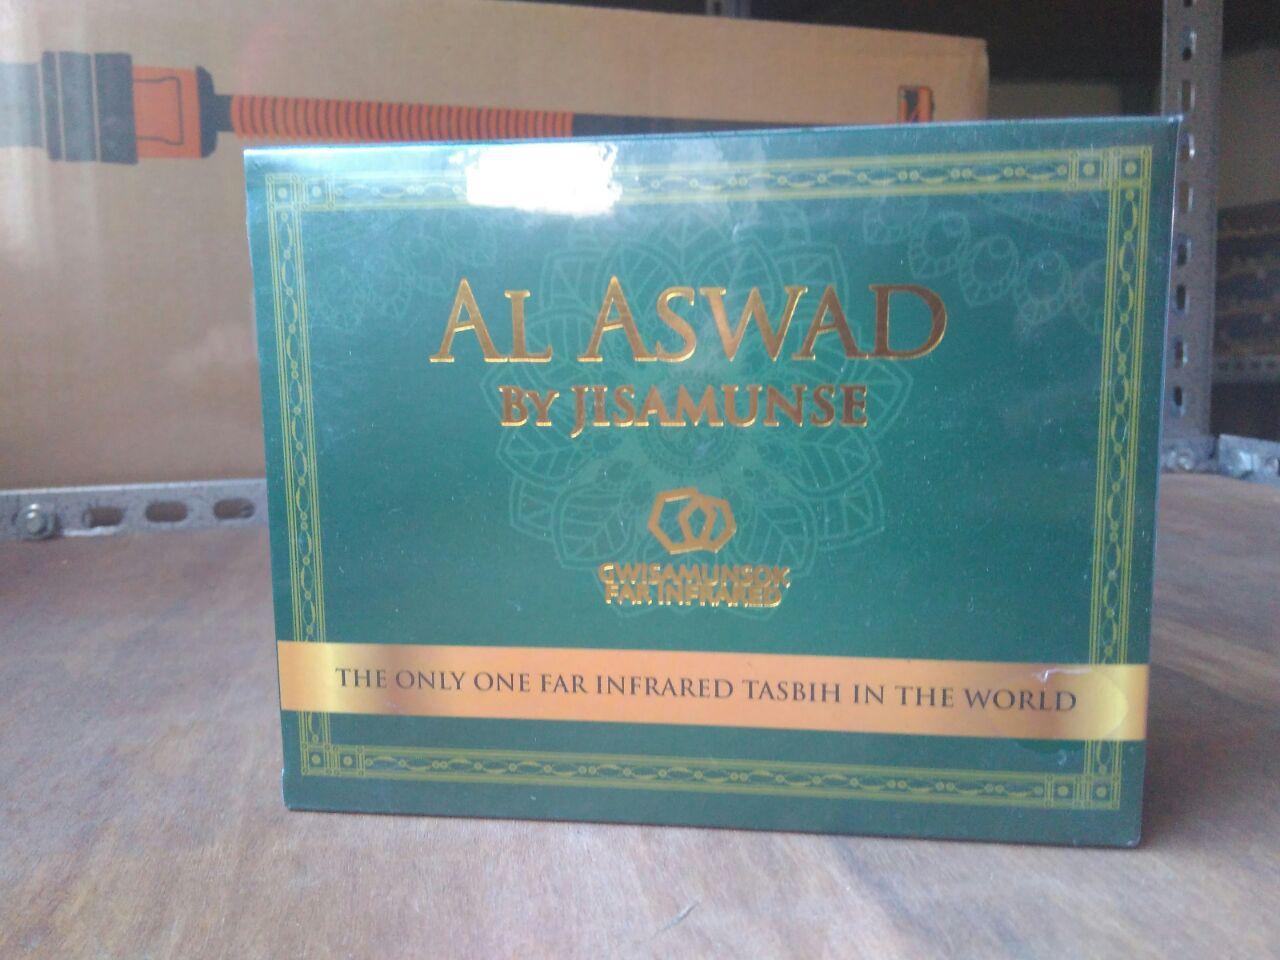 Kalung Kesehatan Al-Aswad